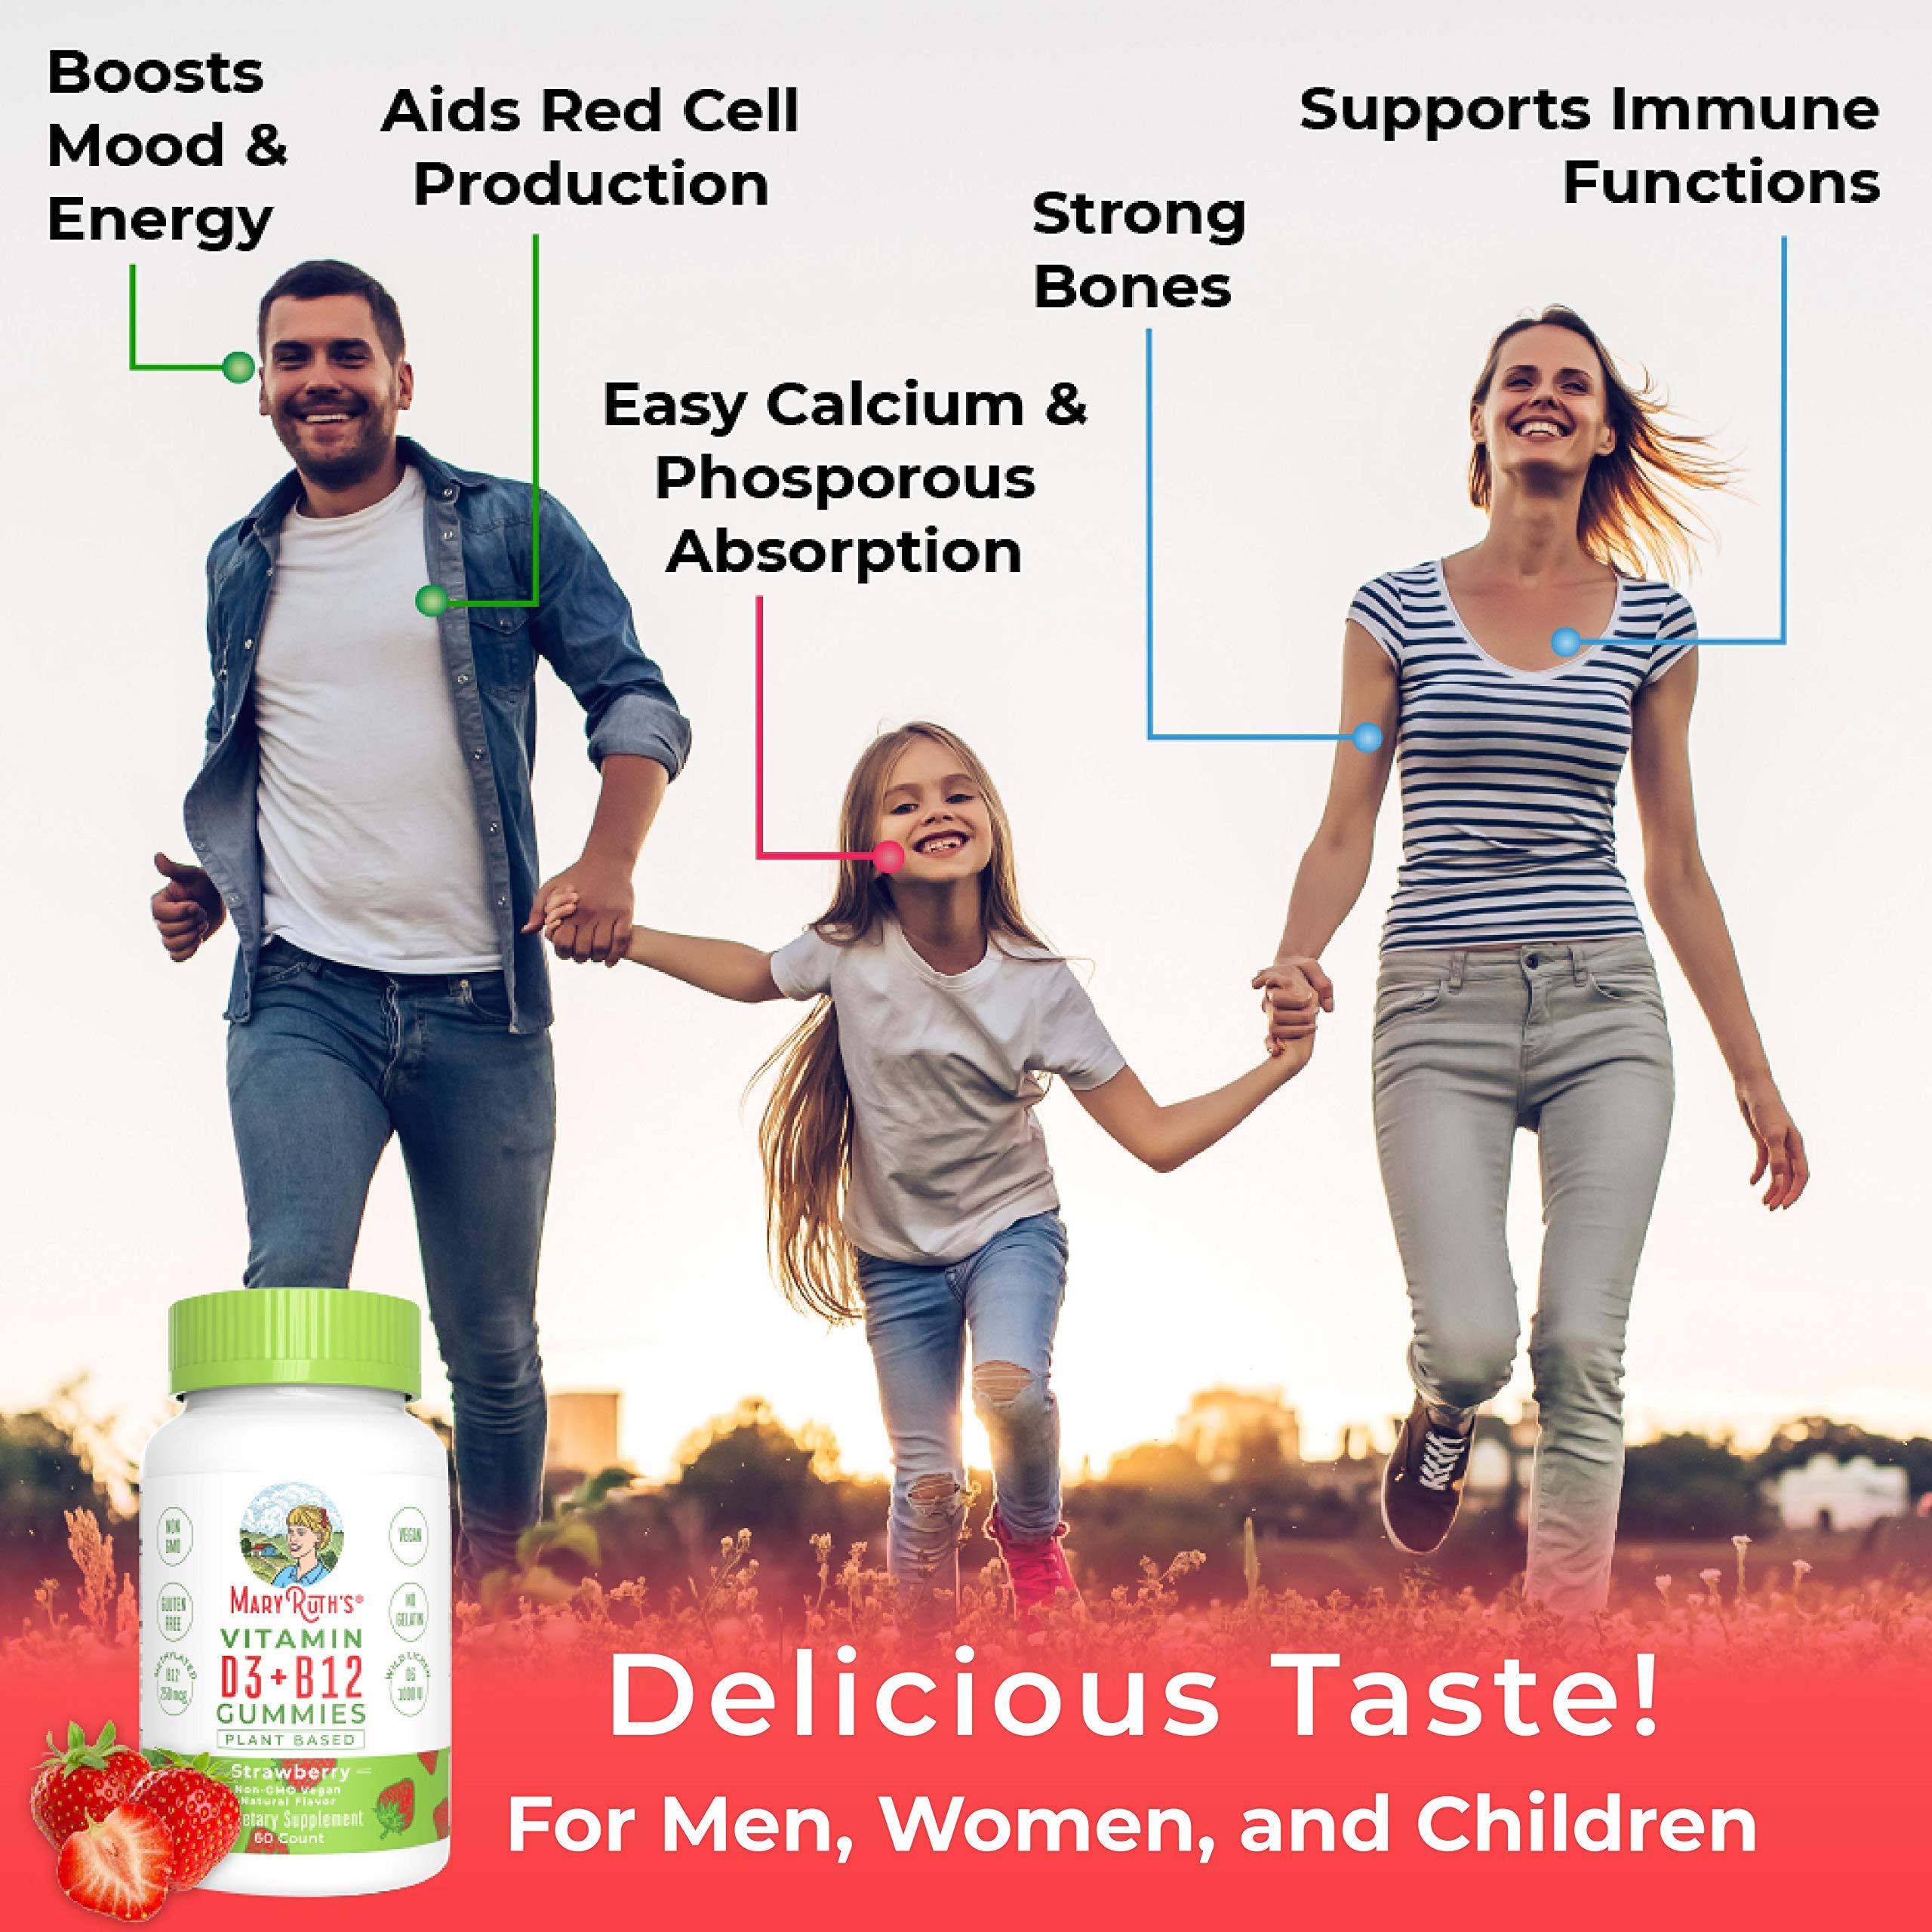 Vegan Vitamin D3+B12 Gummy (Plant-Based Gummies) by MaryRuth\'s - Made w/Organic Ingredients Non-GMO Vegan Paleo Gluten Free for Men, Women & Kids 1000 IU Vitamin D3 & 250 mcg Vitamin B12 60 Count